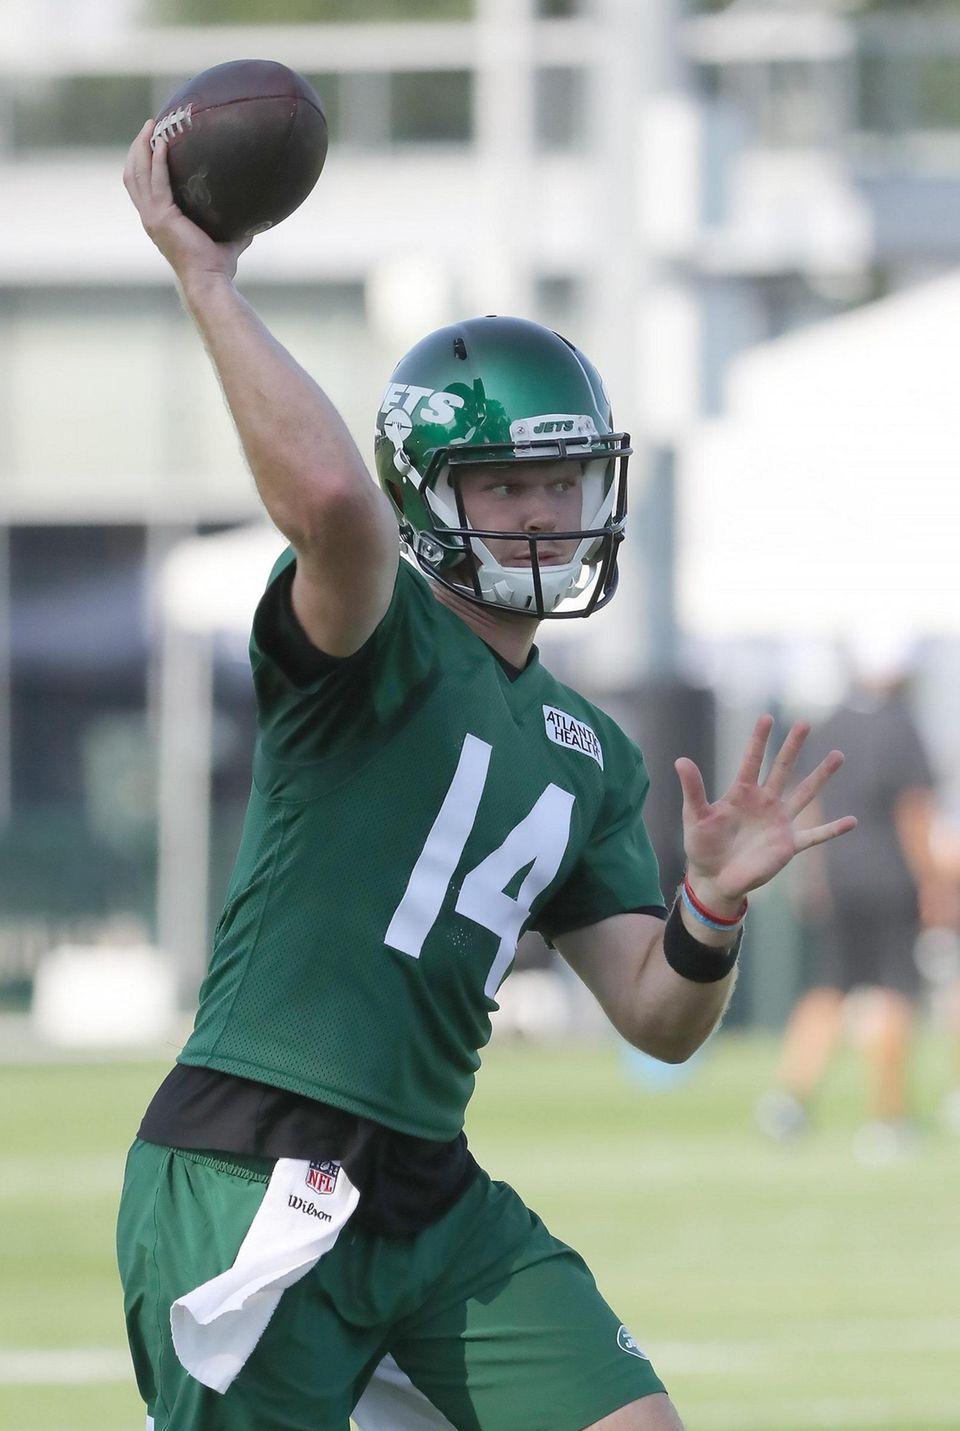 NY Jets quarterback Sam Darnold (14) throws from